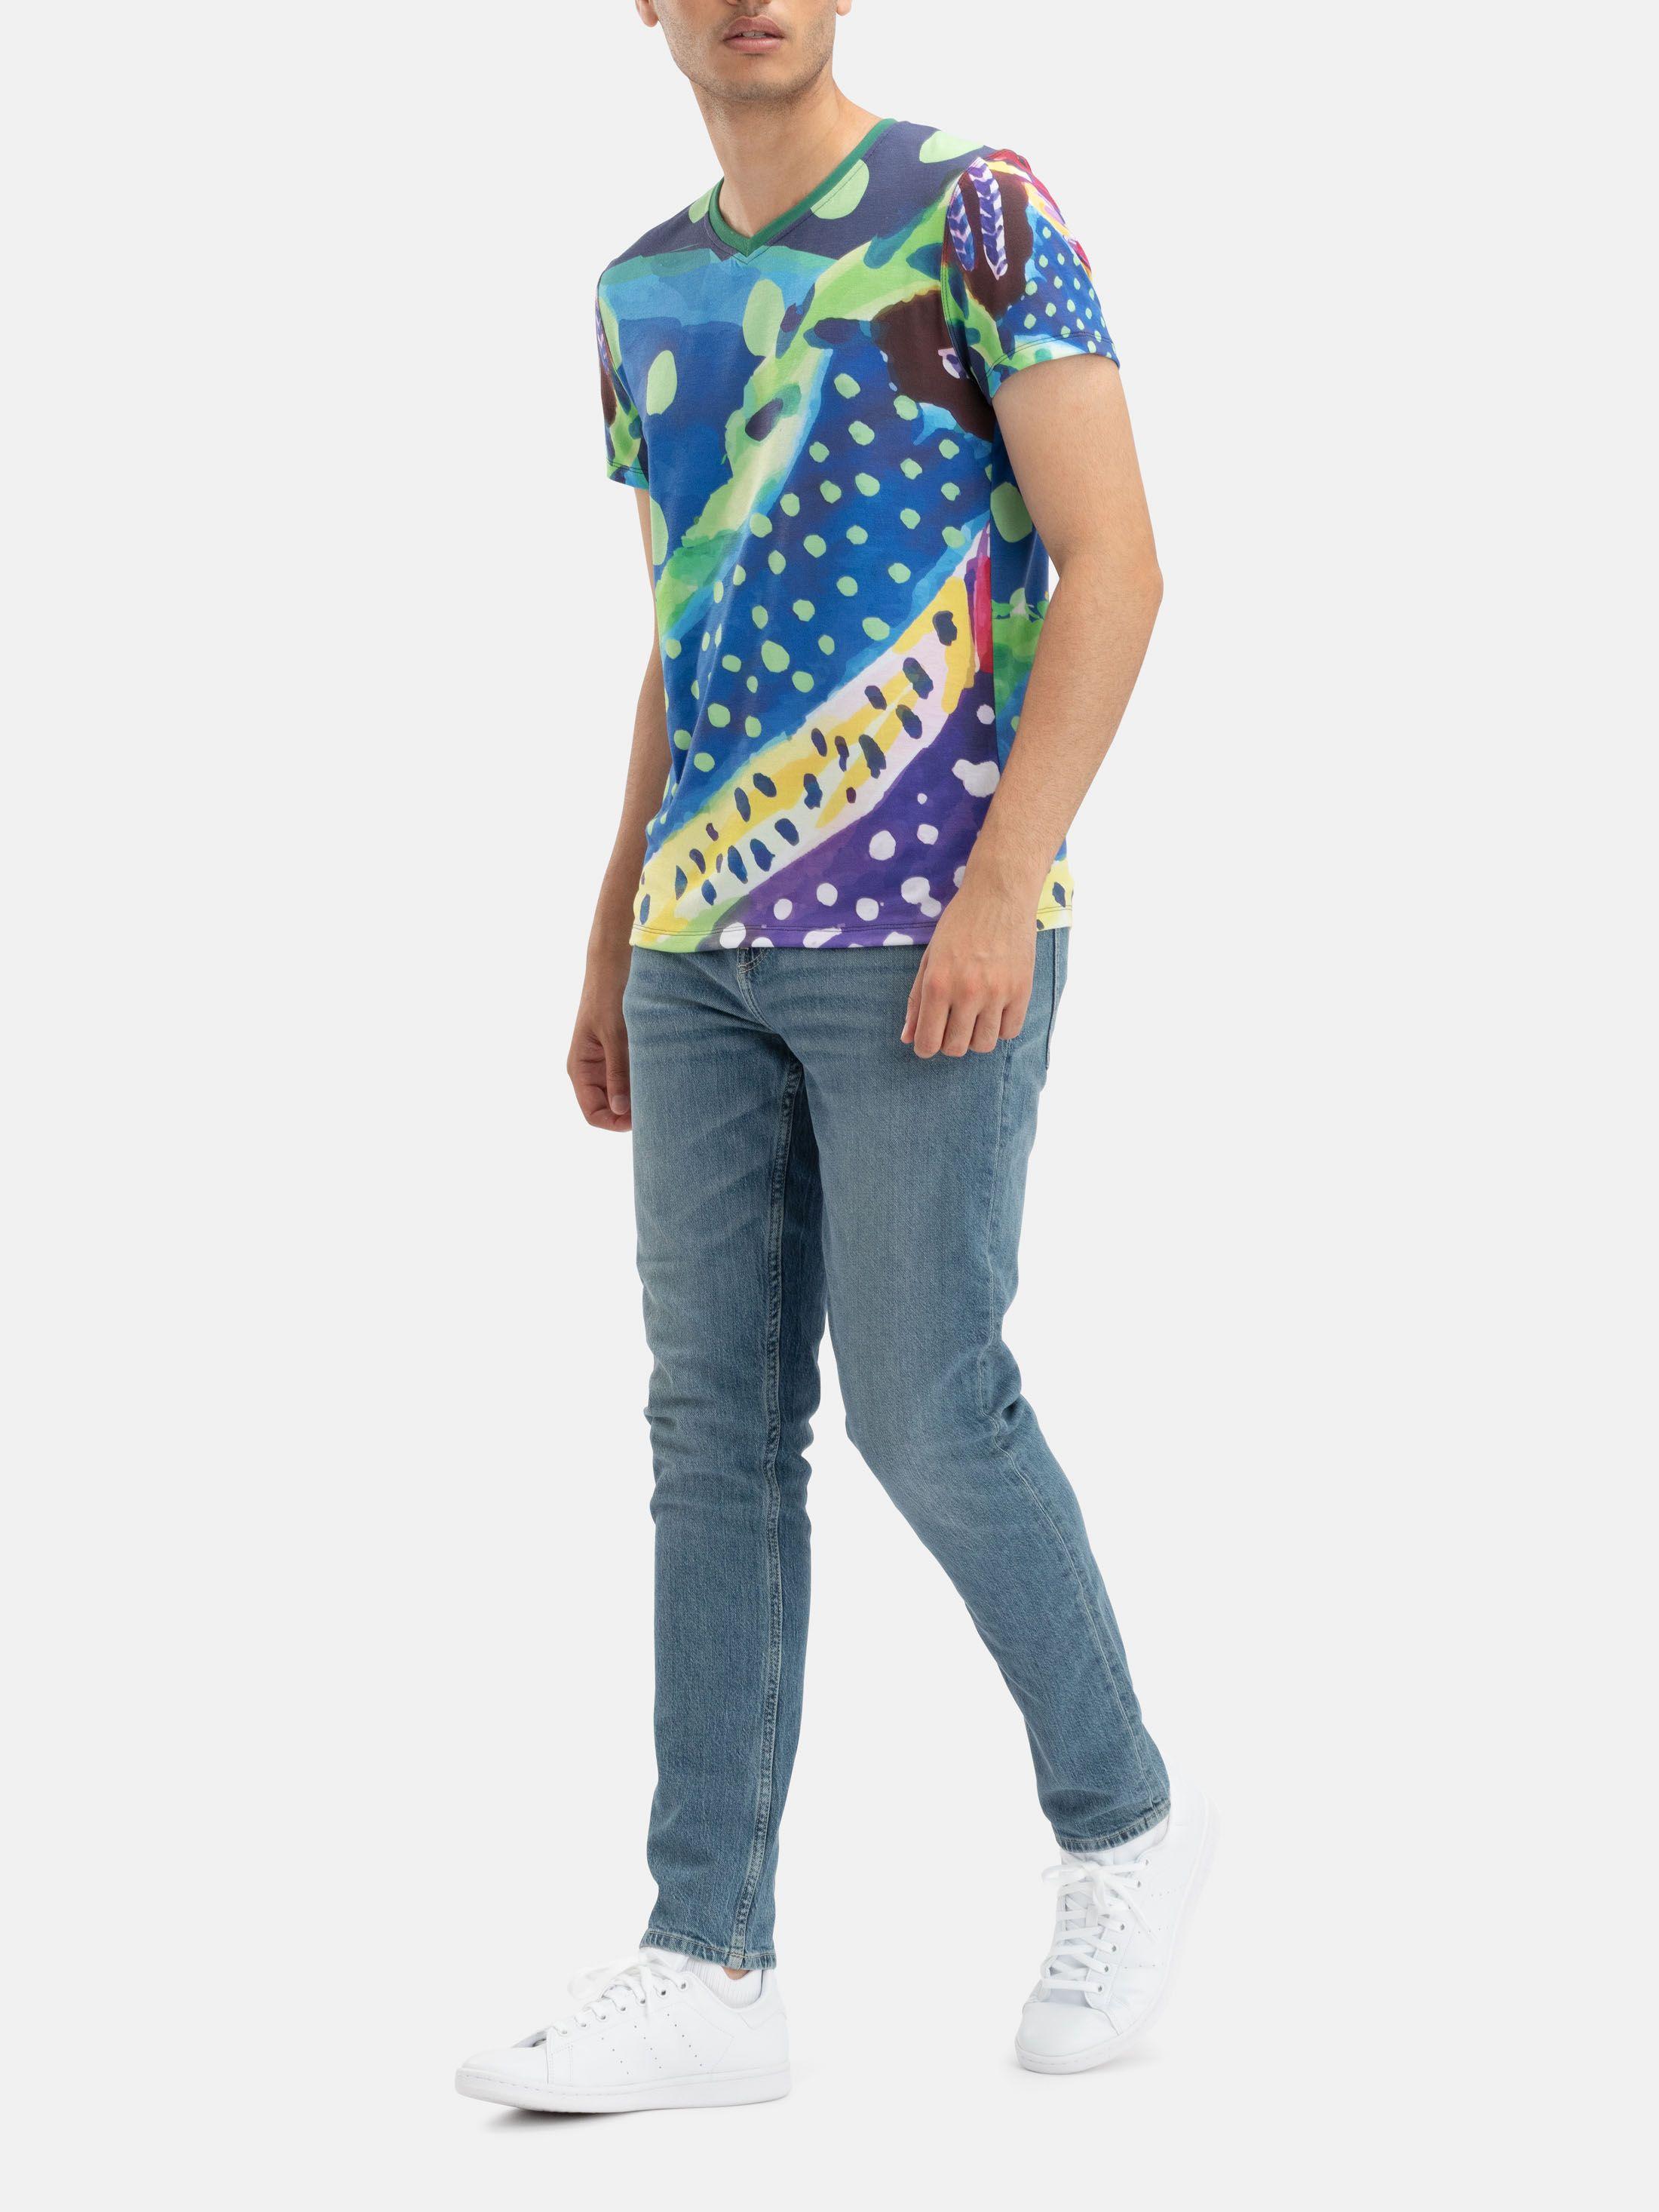 Eco T-Shirt Printing UK